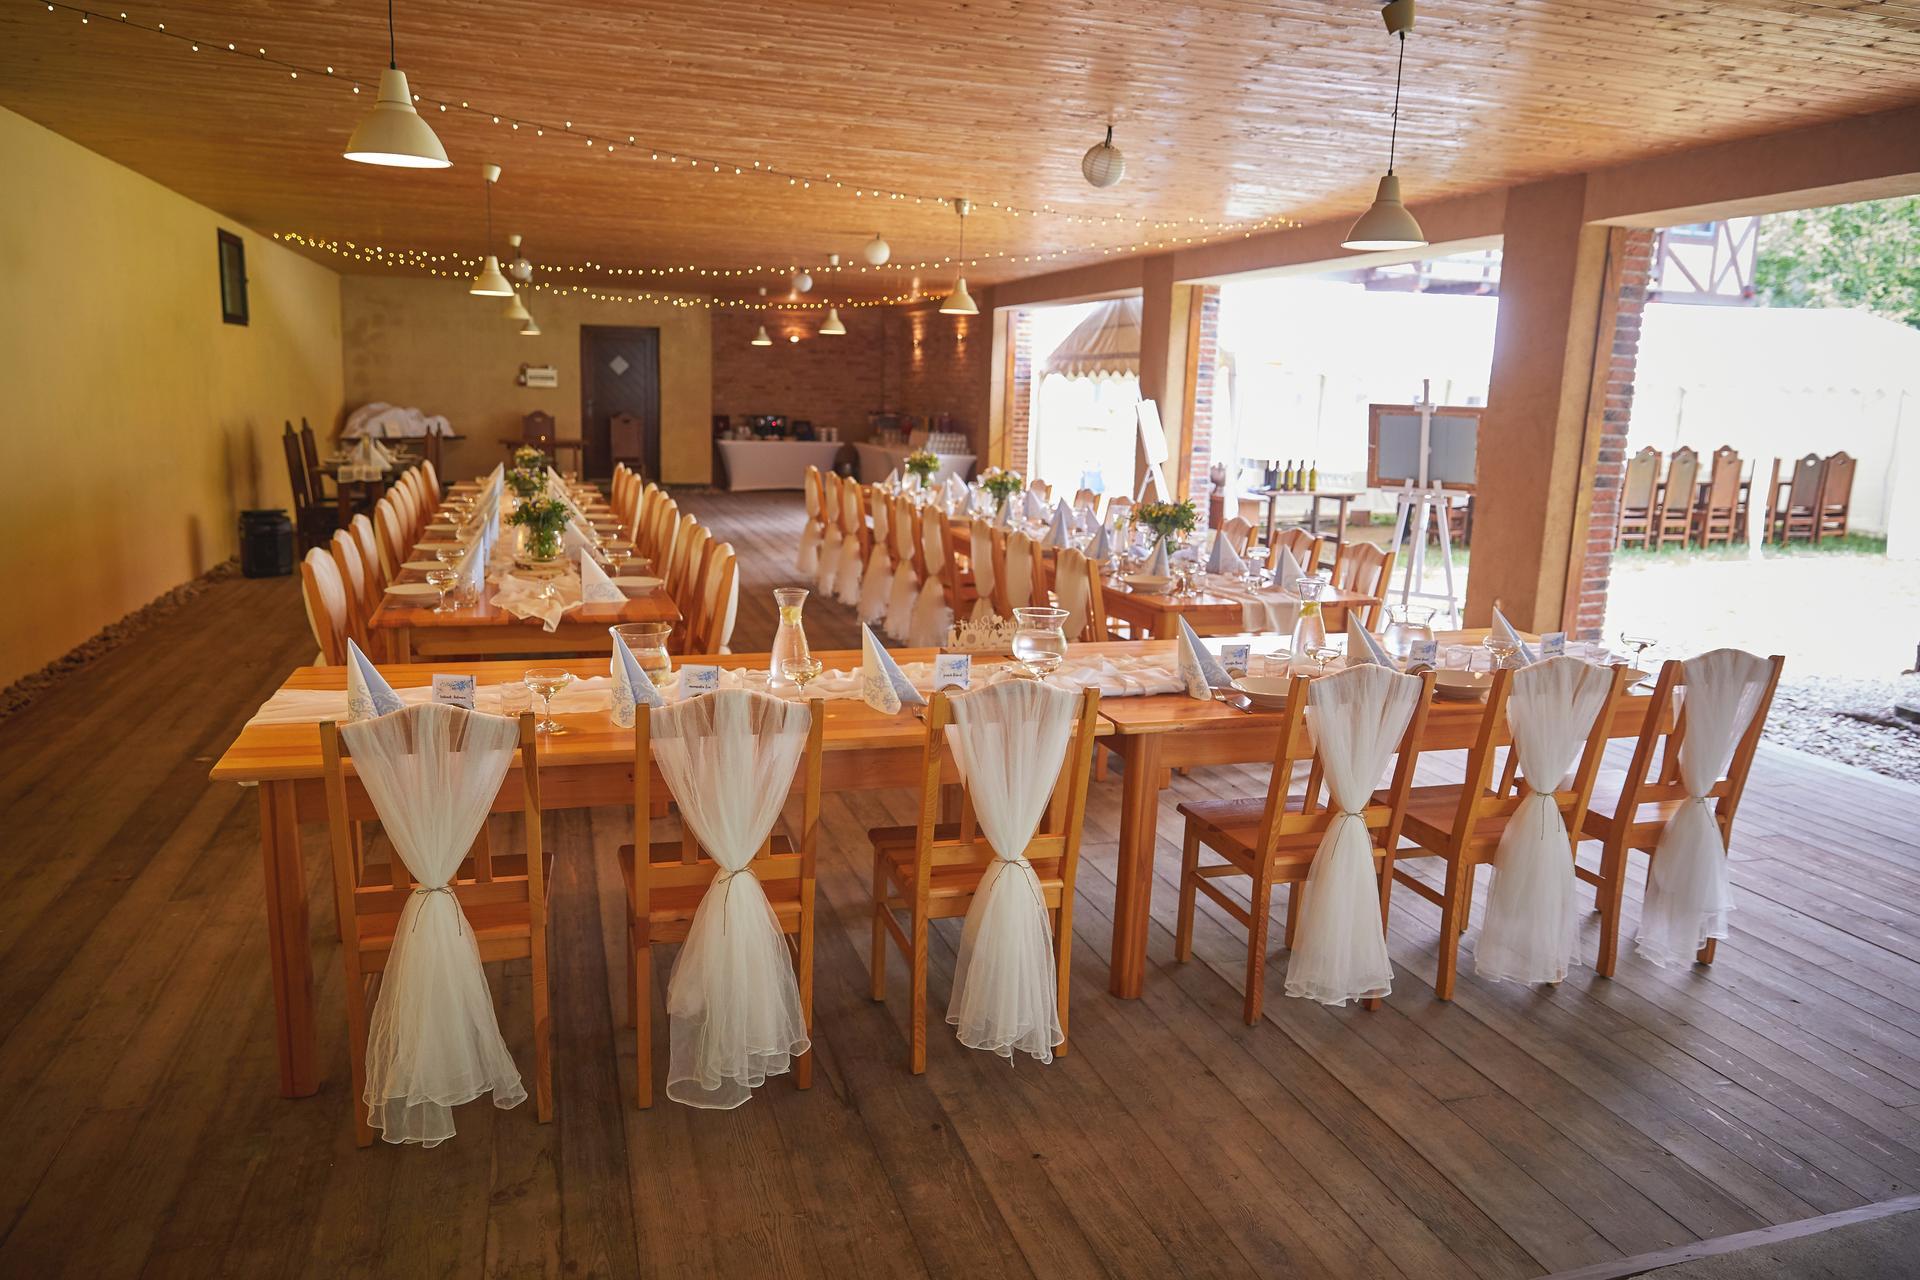 Svatba 6.6.2020 - Místo oslavy: Adamov Švýcárna.